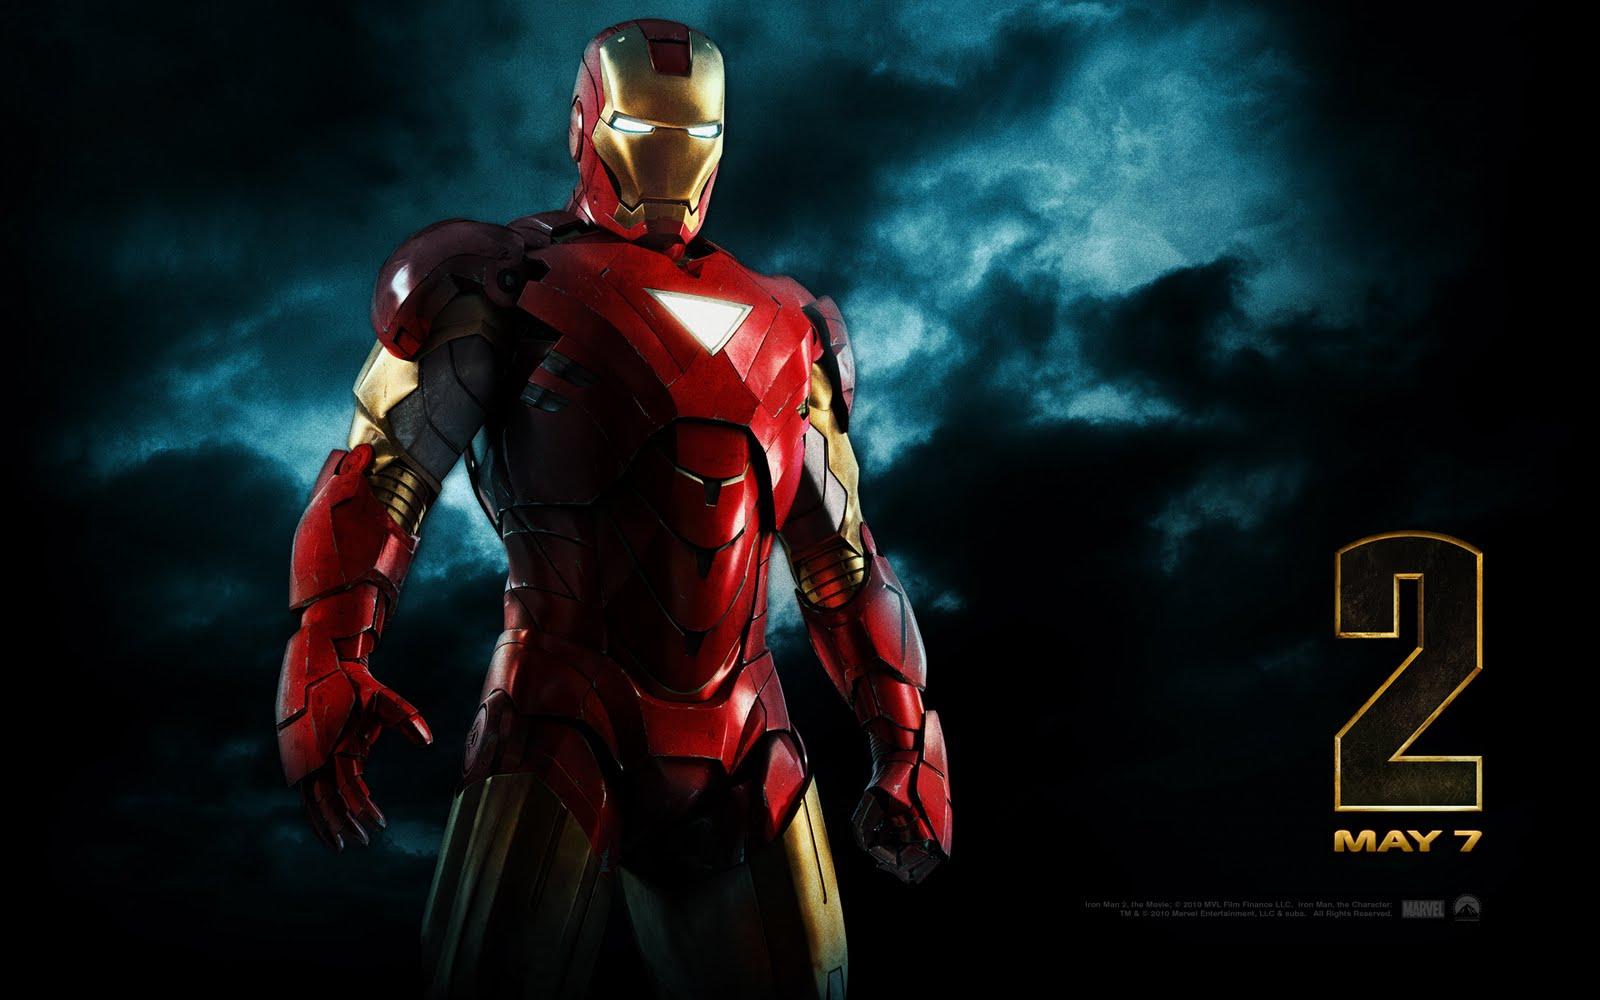 Iron Man 2 wallpaper 7